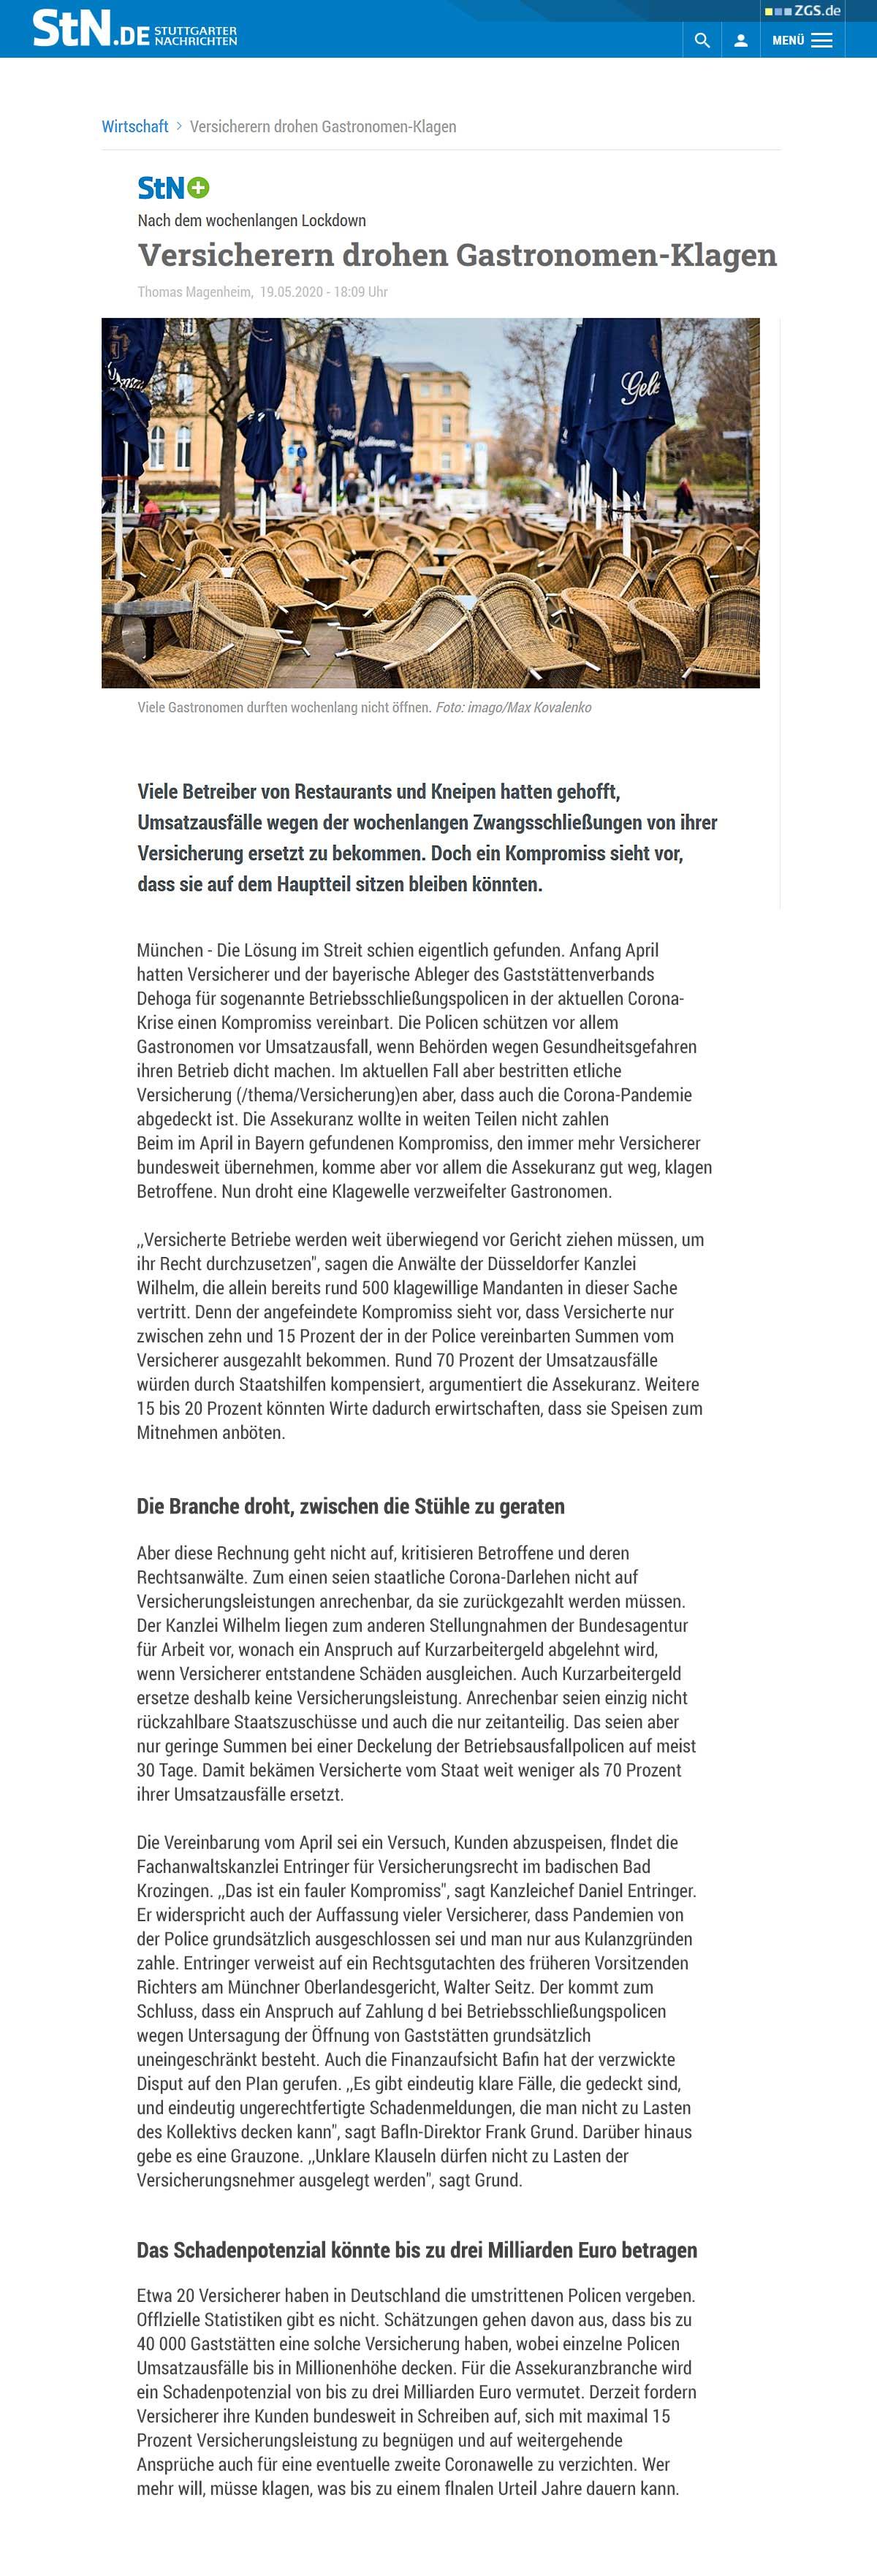 Betriebsschließungsversicherung Stuttgarter Nachrichten